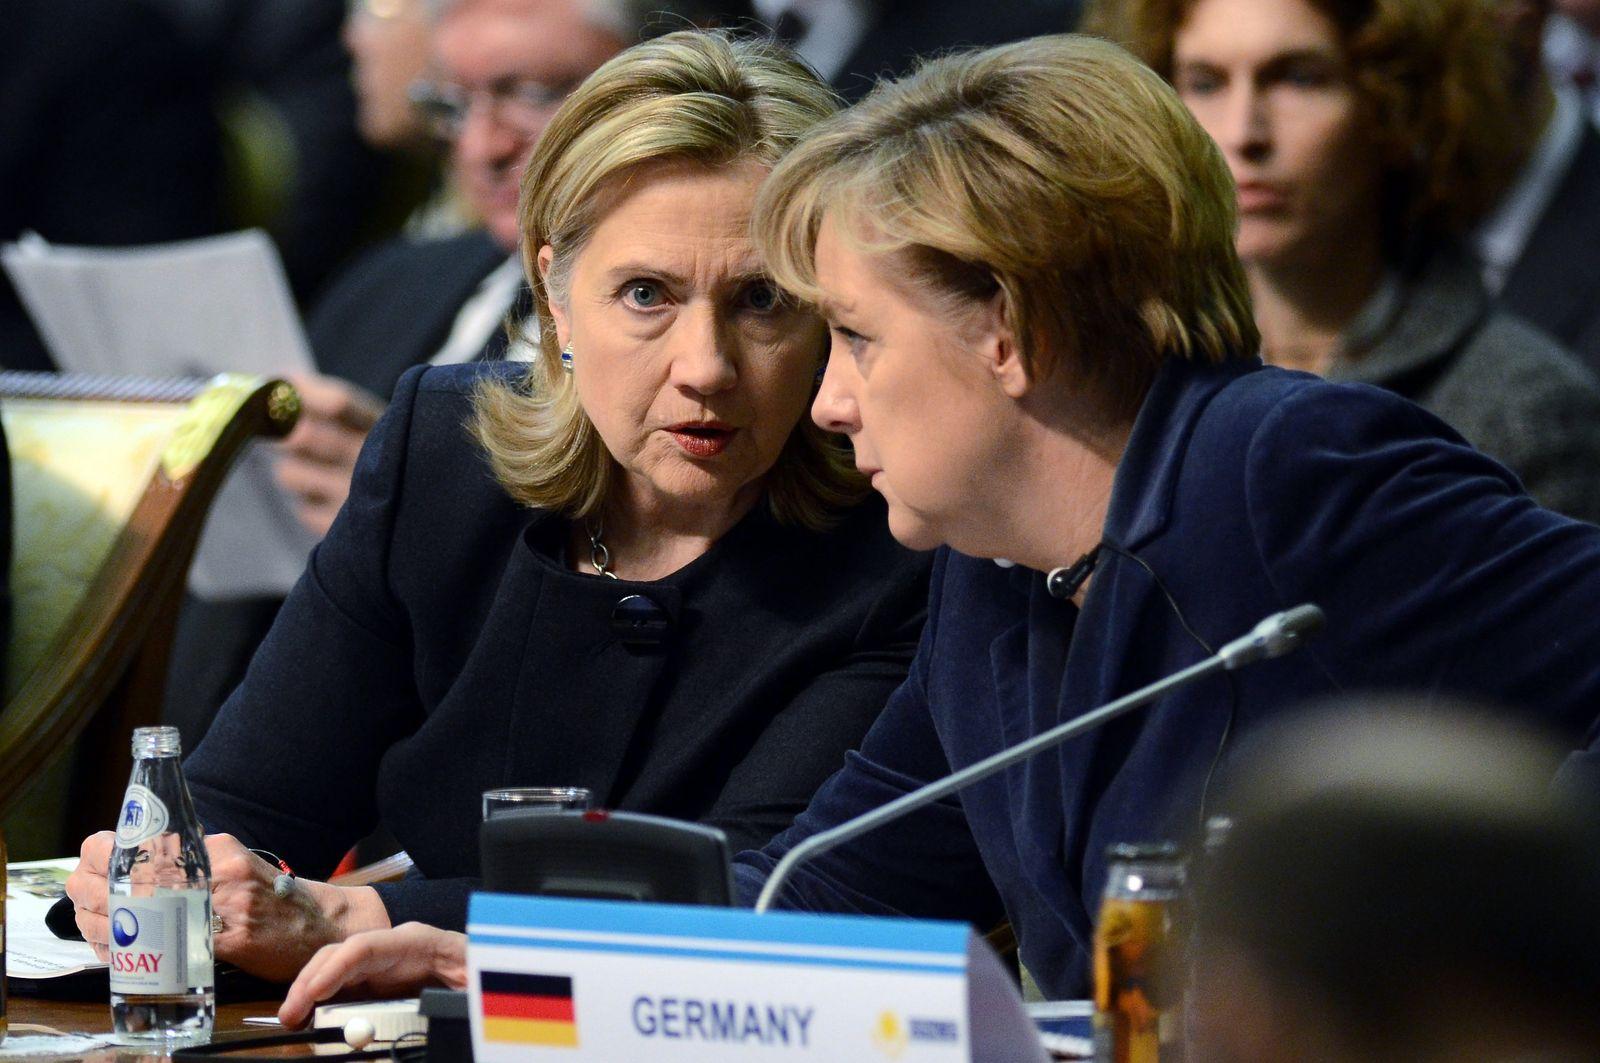 OSZE-Gipfel / Kasachstan / Merkel Clinton